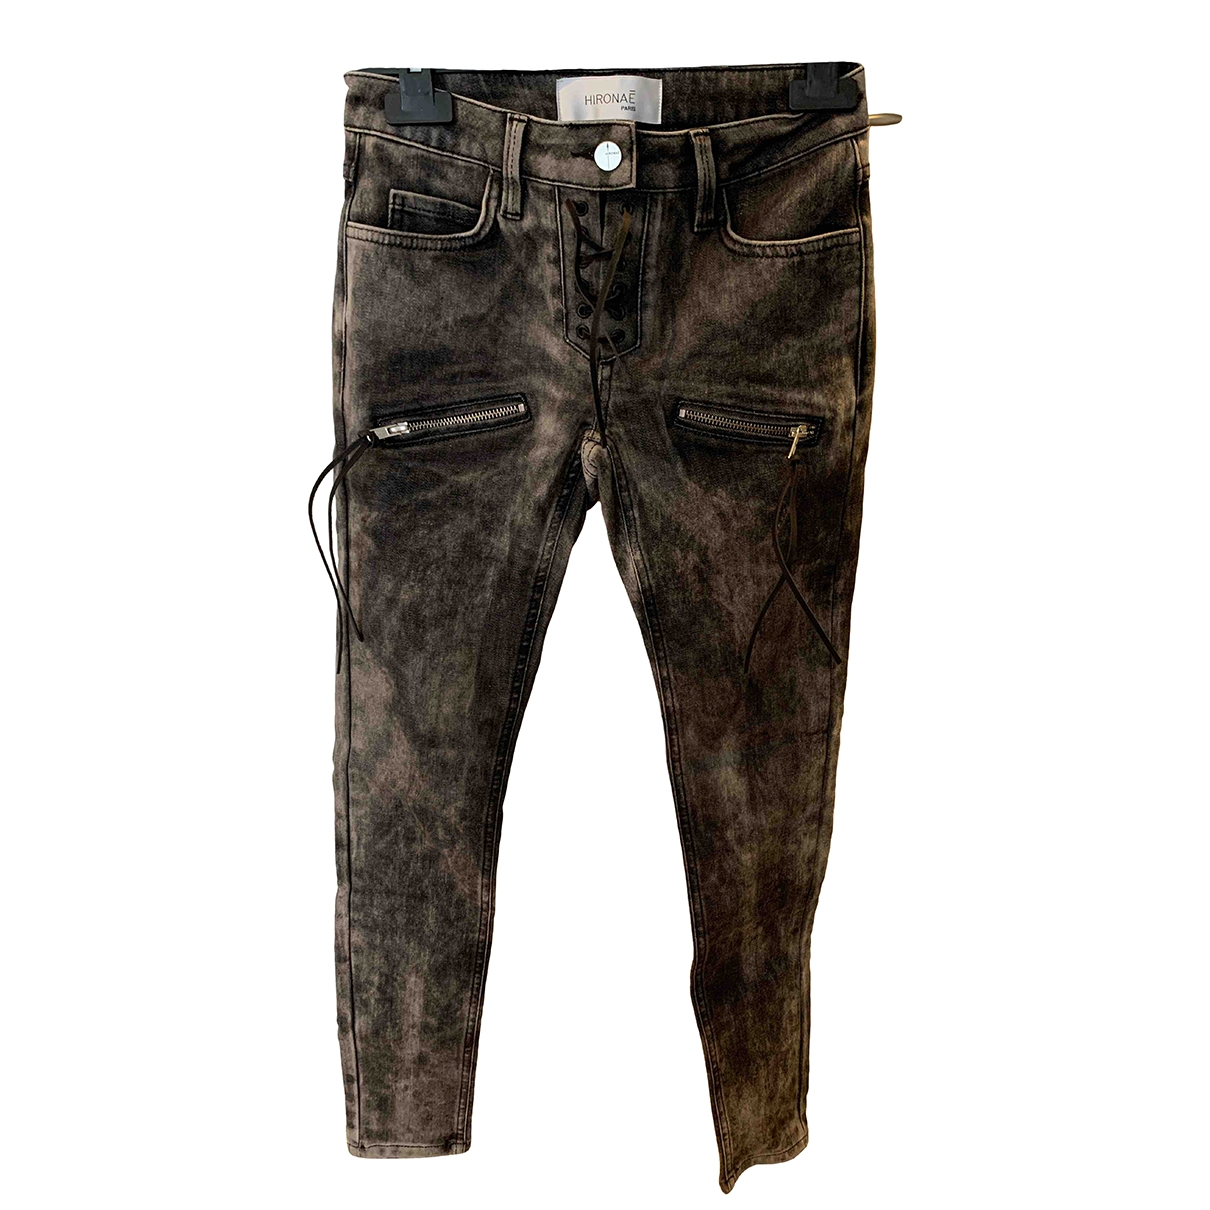 Hironae \N Grey Cotton Jeans for Women 34 FR